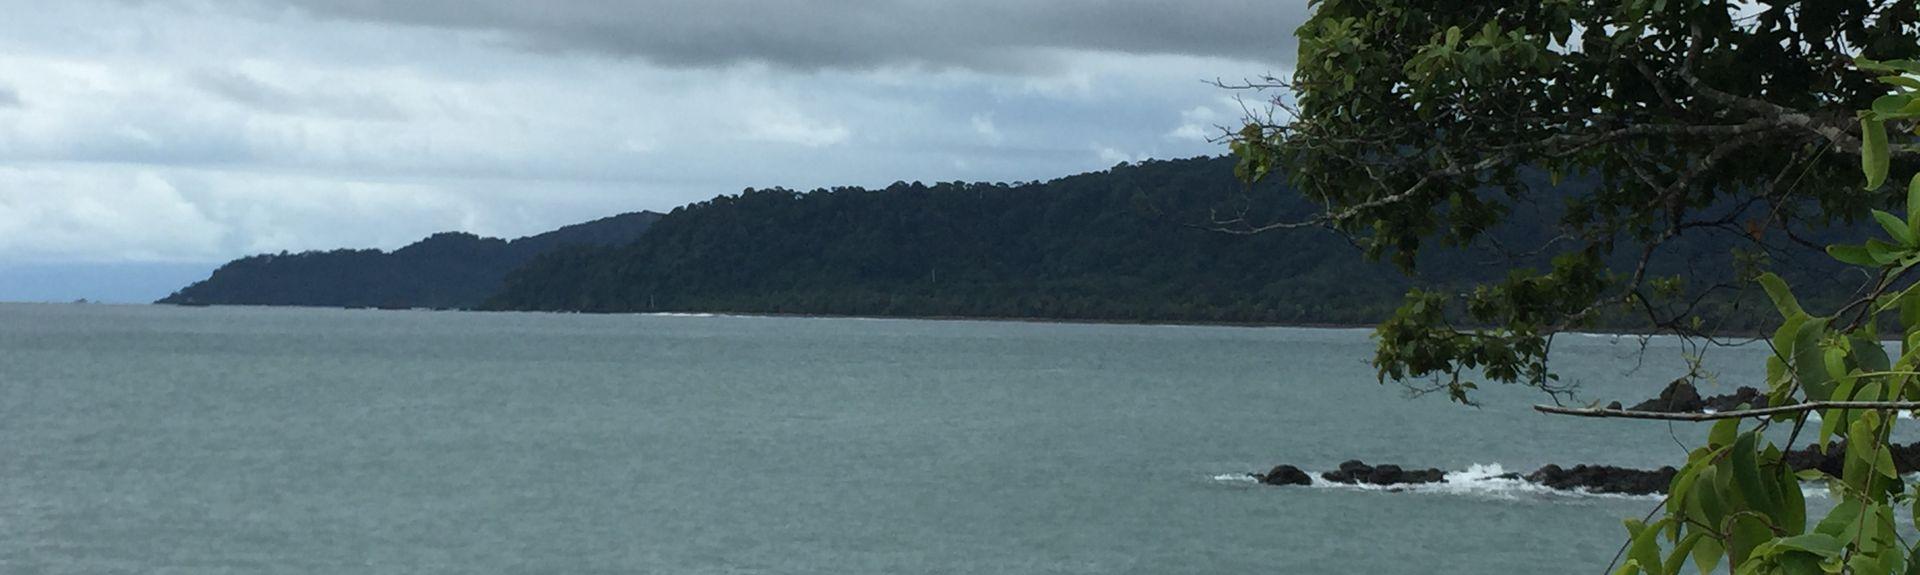 Drake Bay, Puntarenas (province), Costa Rica